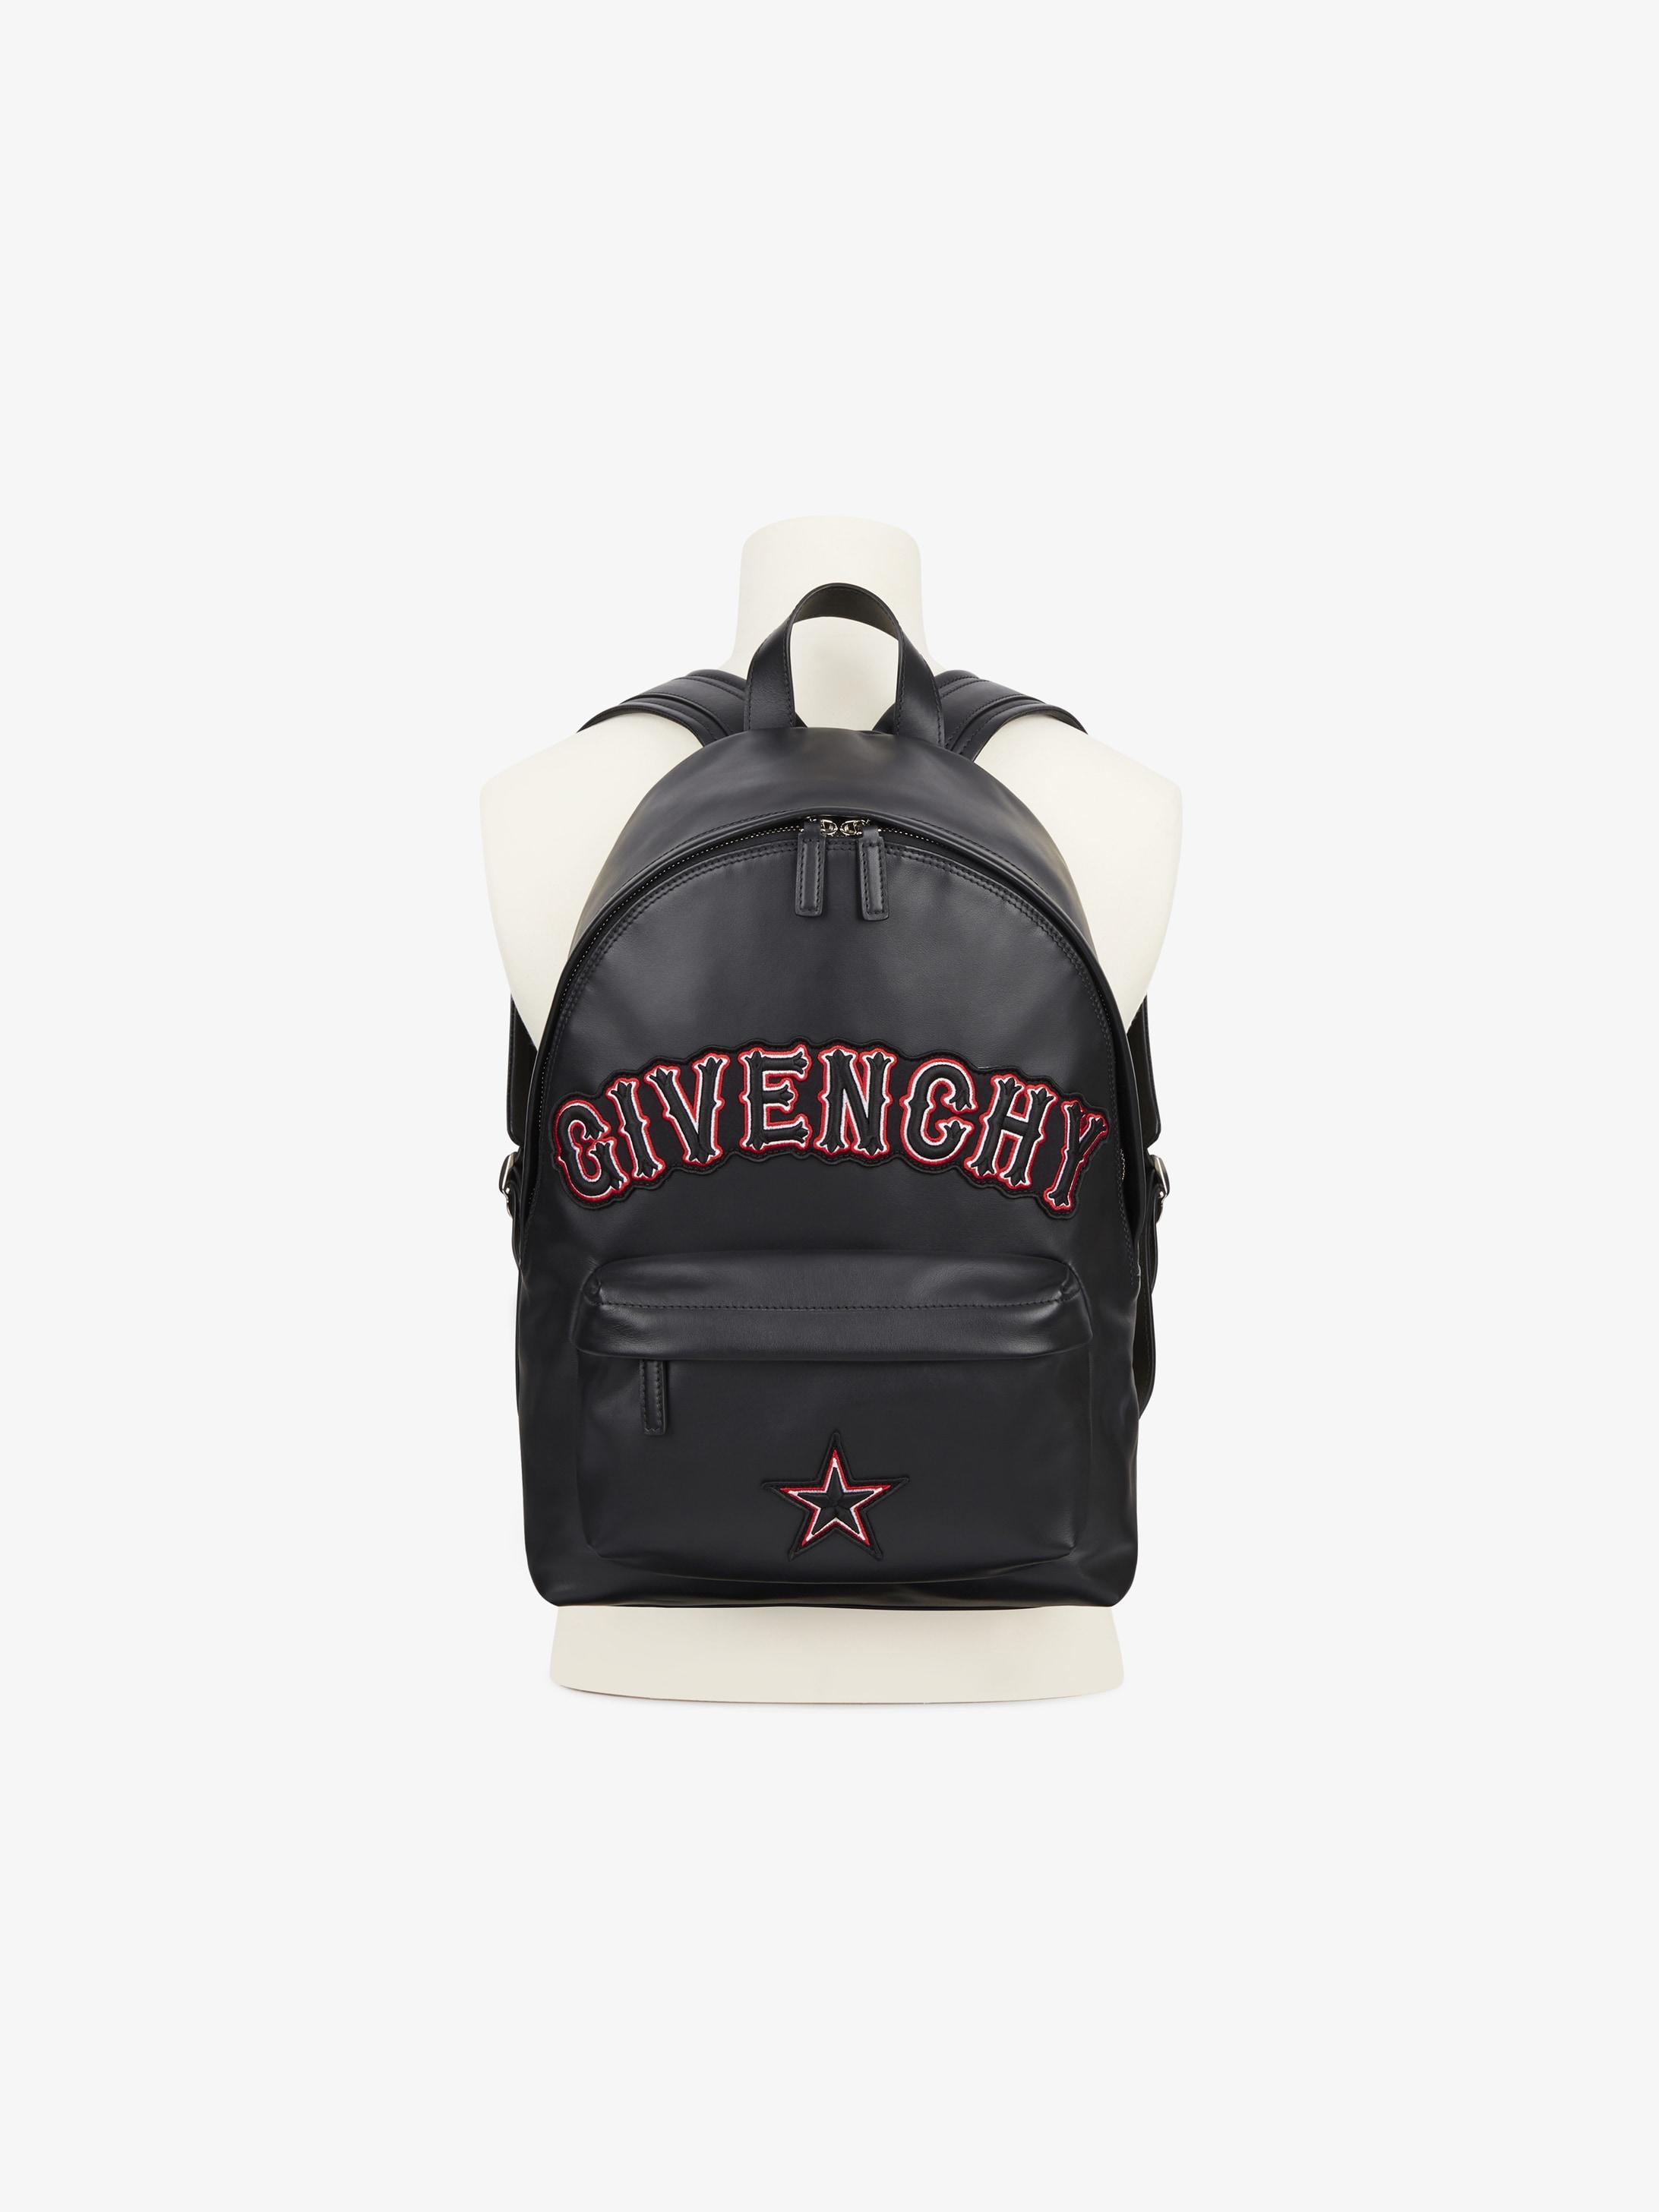 Givenchy贴片背包